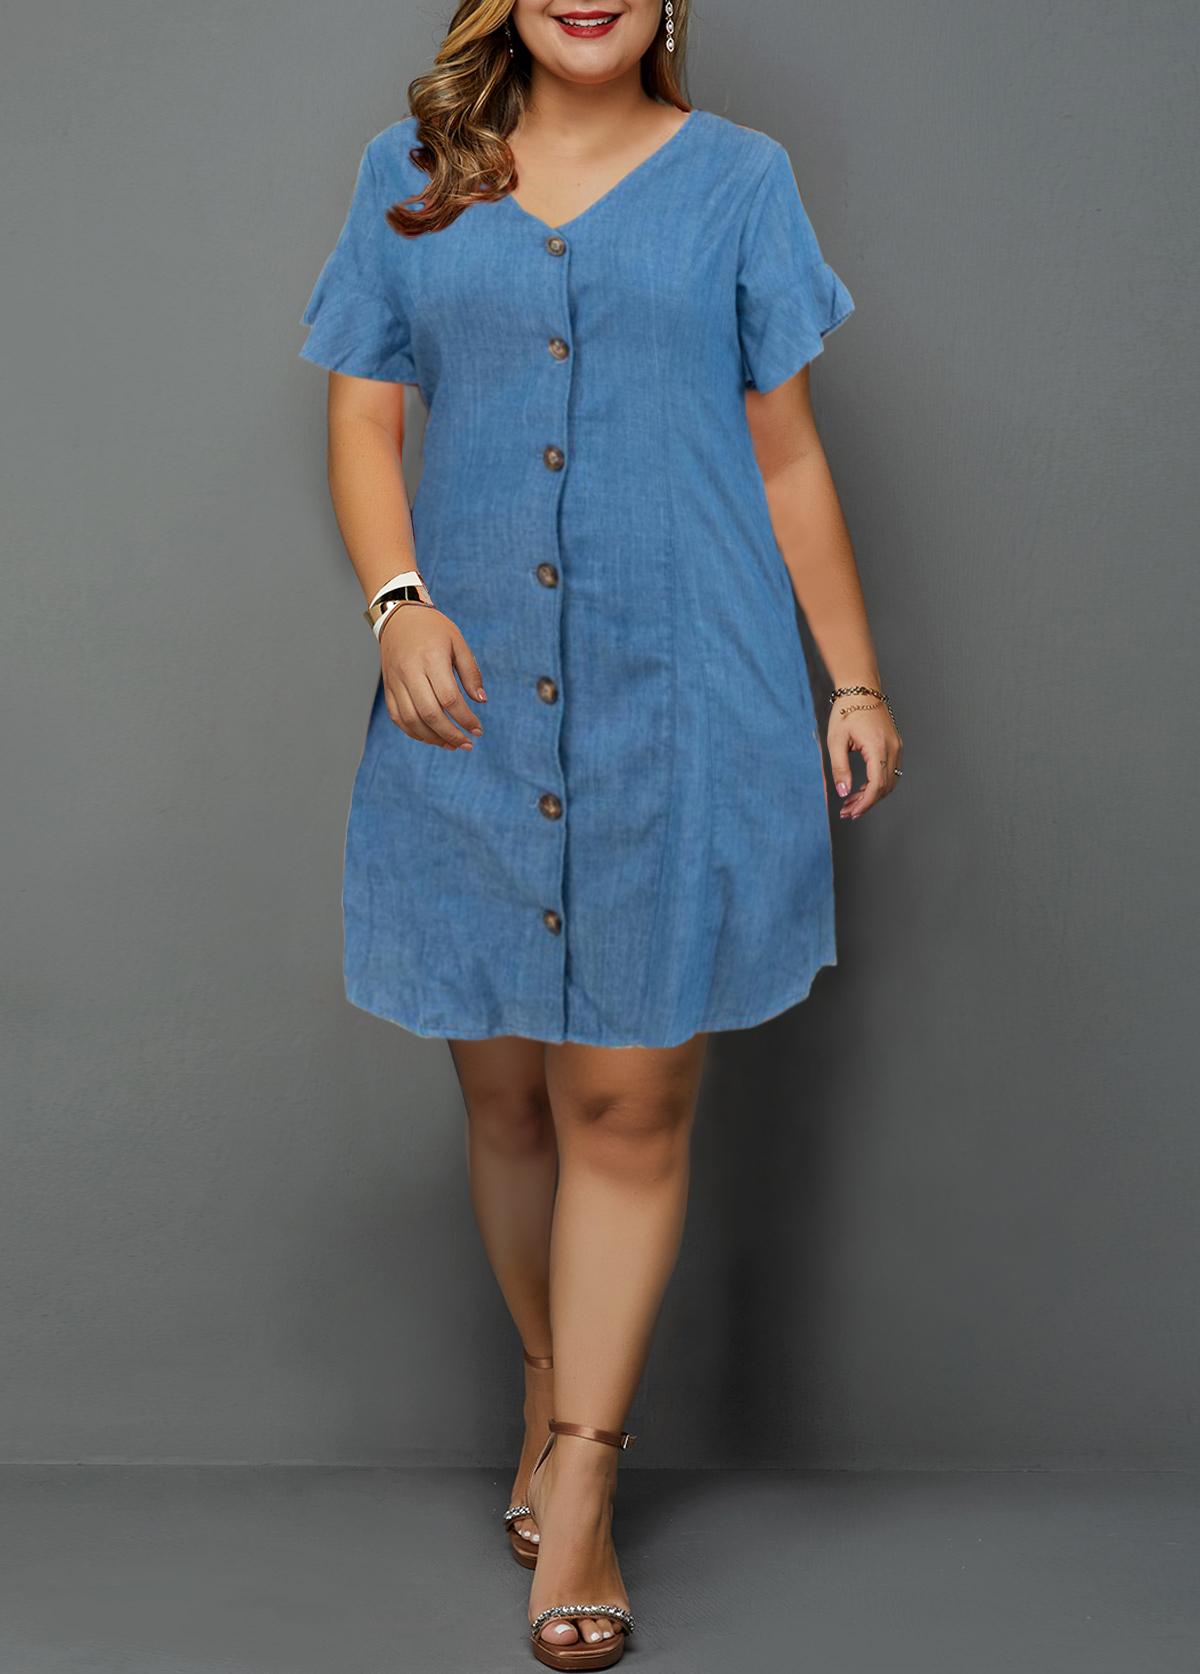 Plus Size Denim V Neck Button Up Shirt Dress